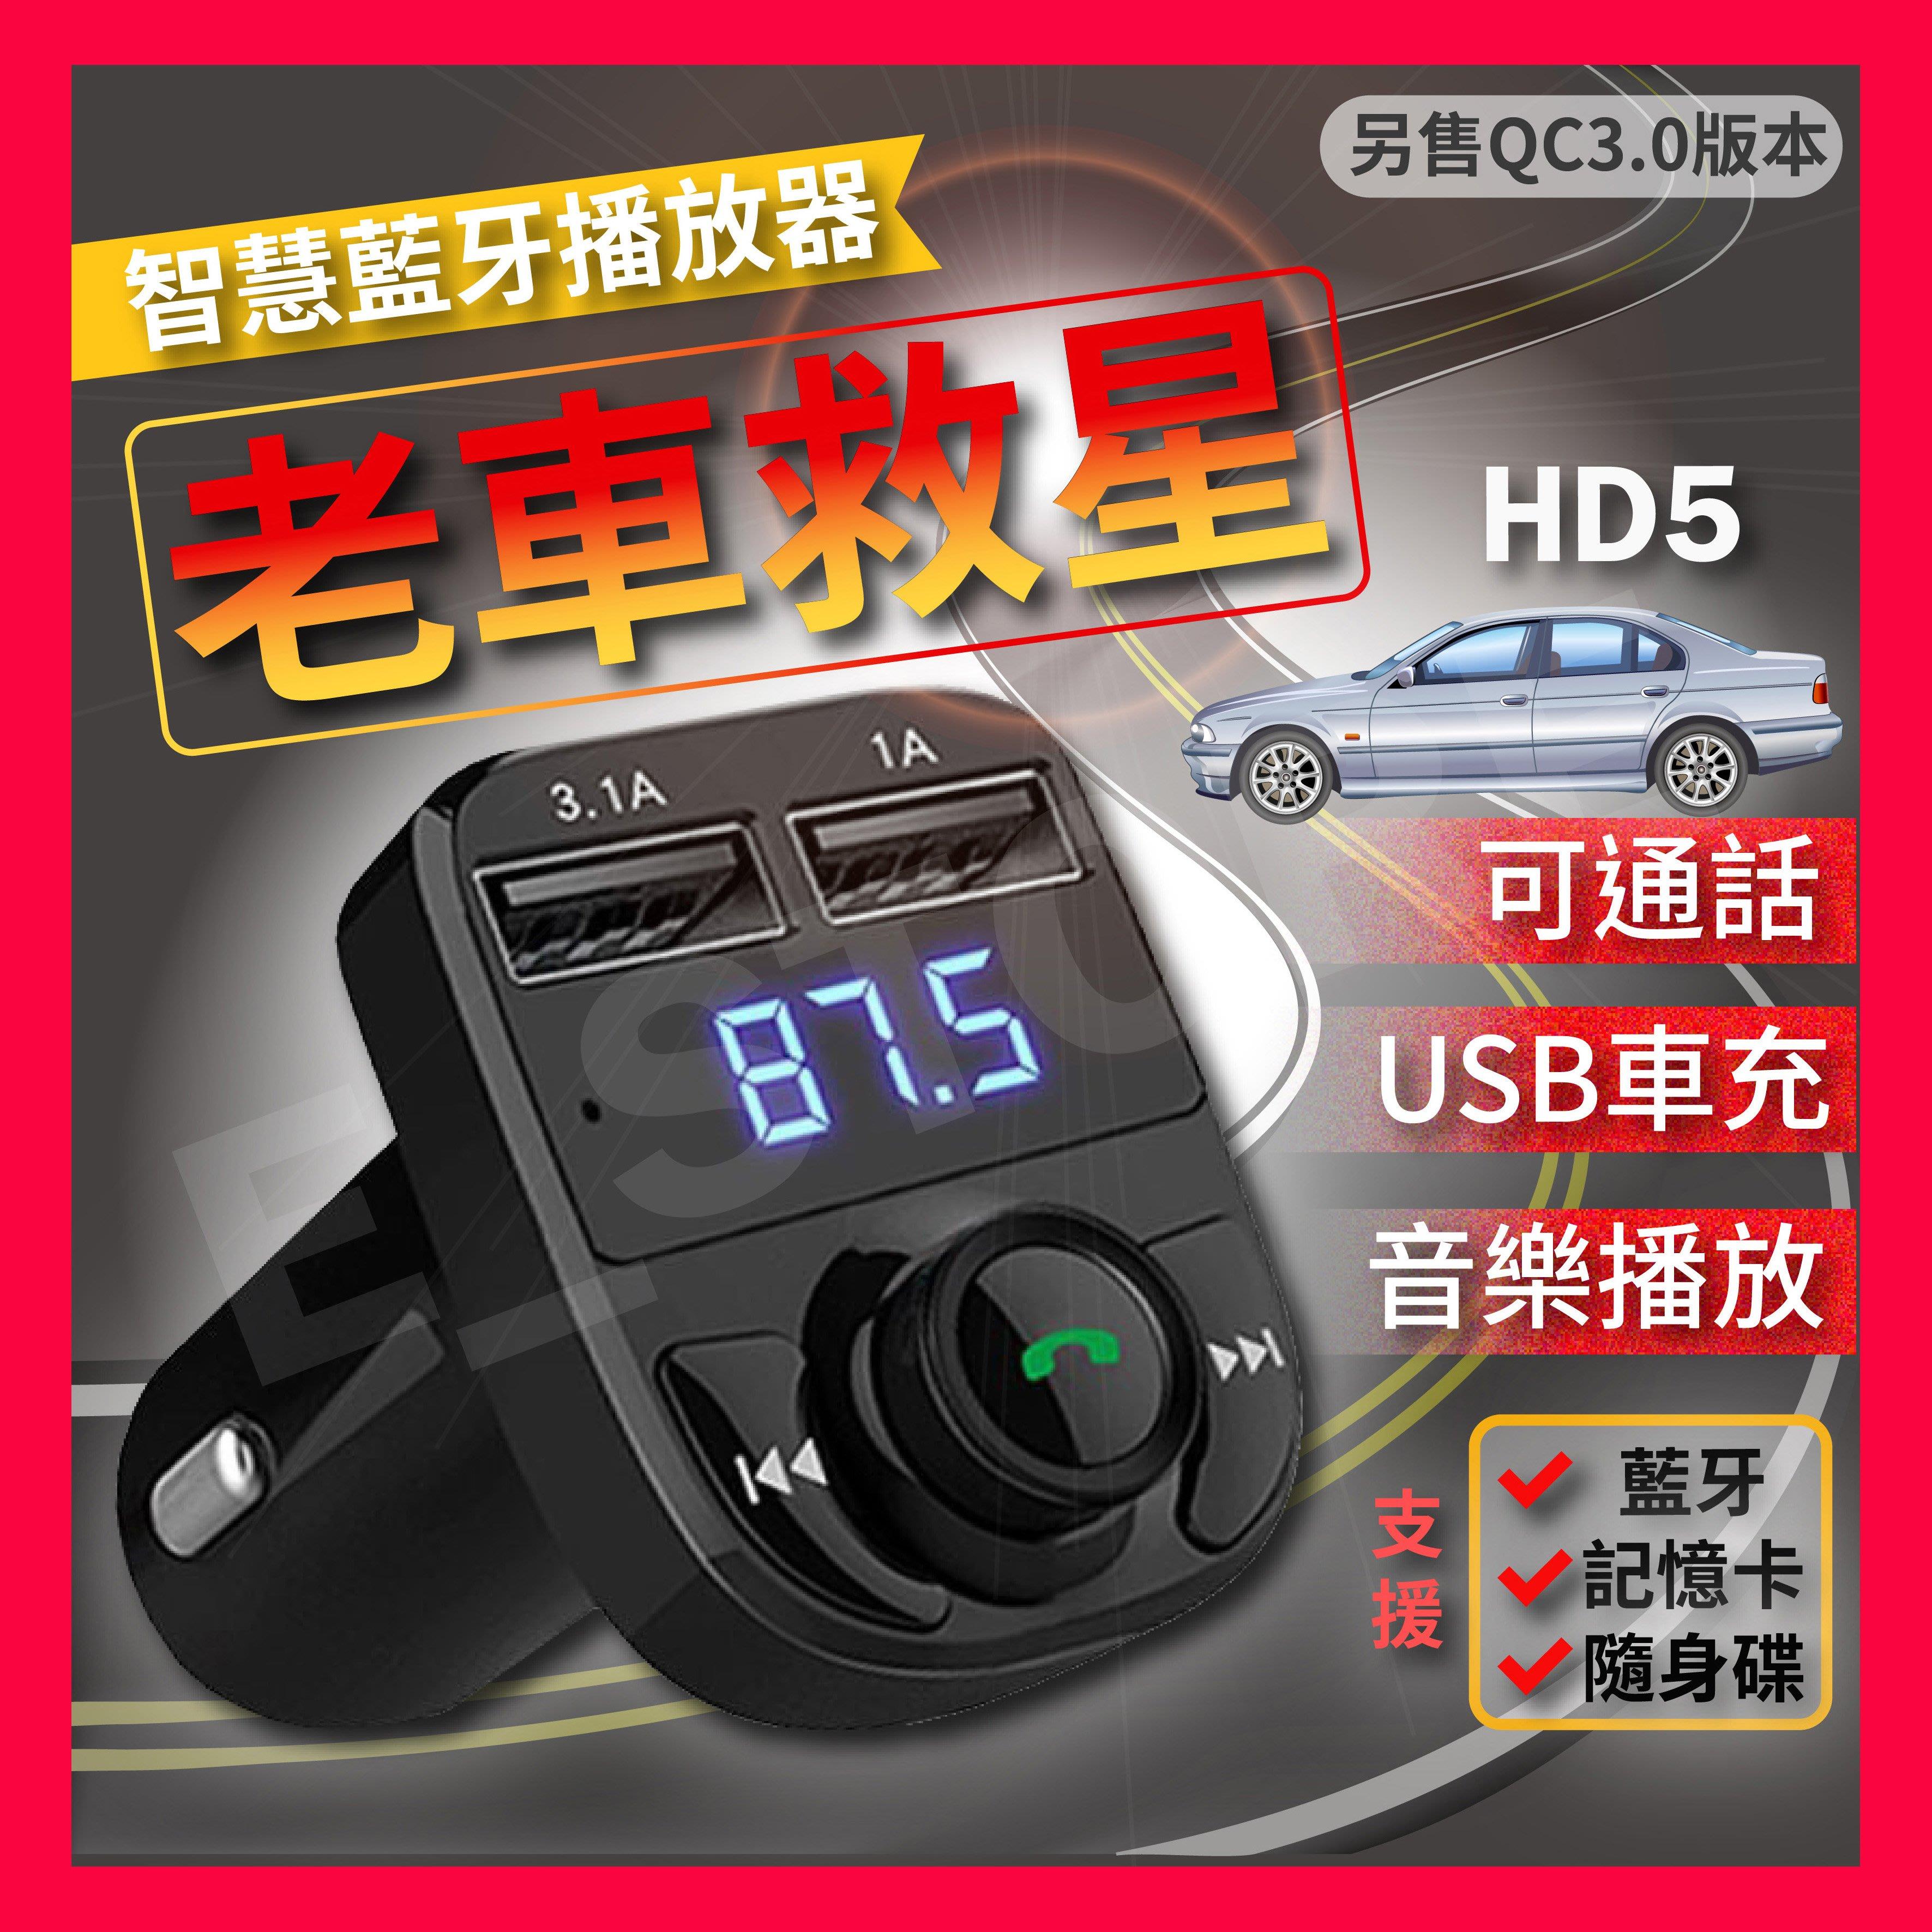 【現貨】 HD5雙USB車載藍牙 HY82車用Mp3音樂播放器 車載藍芽 藍芽/SD卡/隨身碟播放 FM發射器